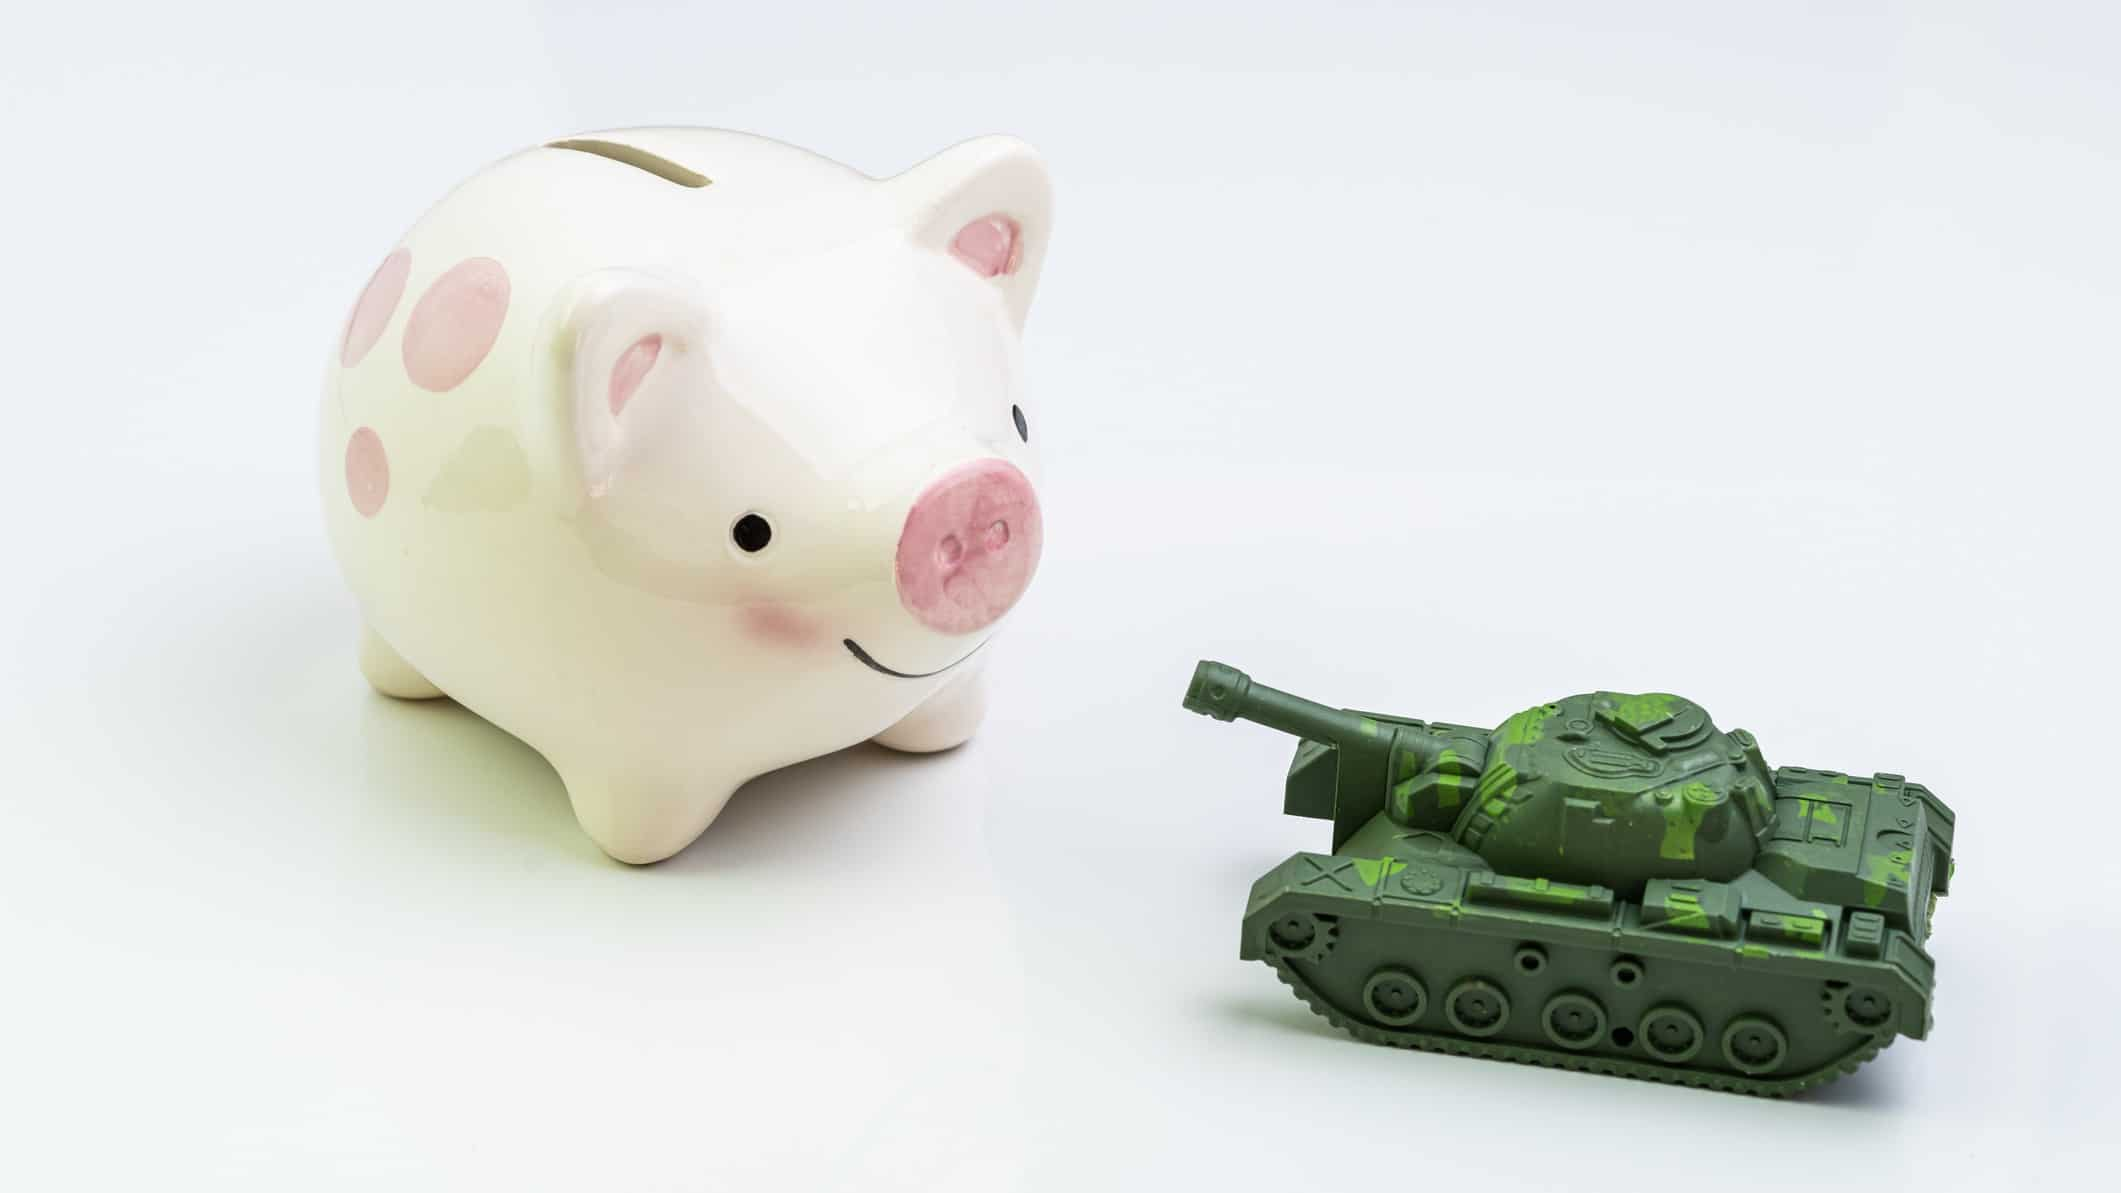 piggy bank next to miniature army tank